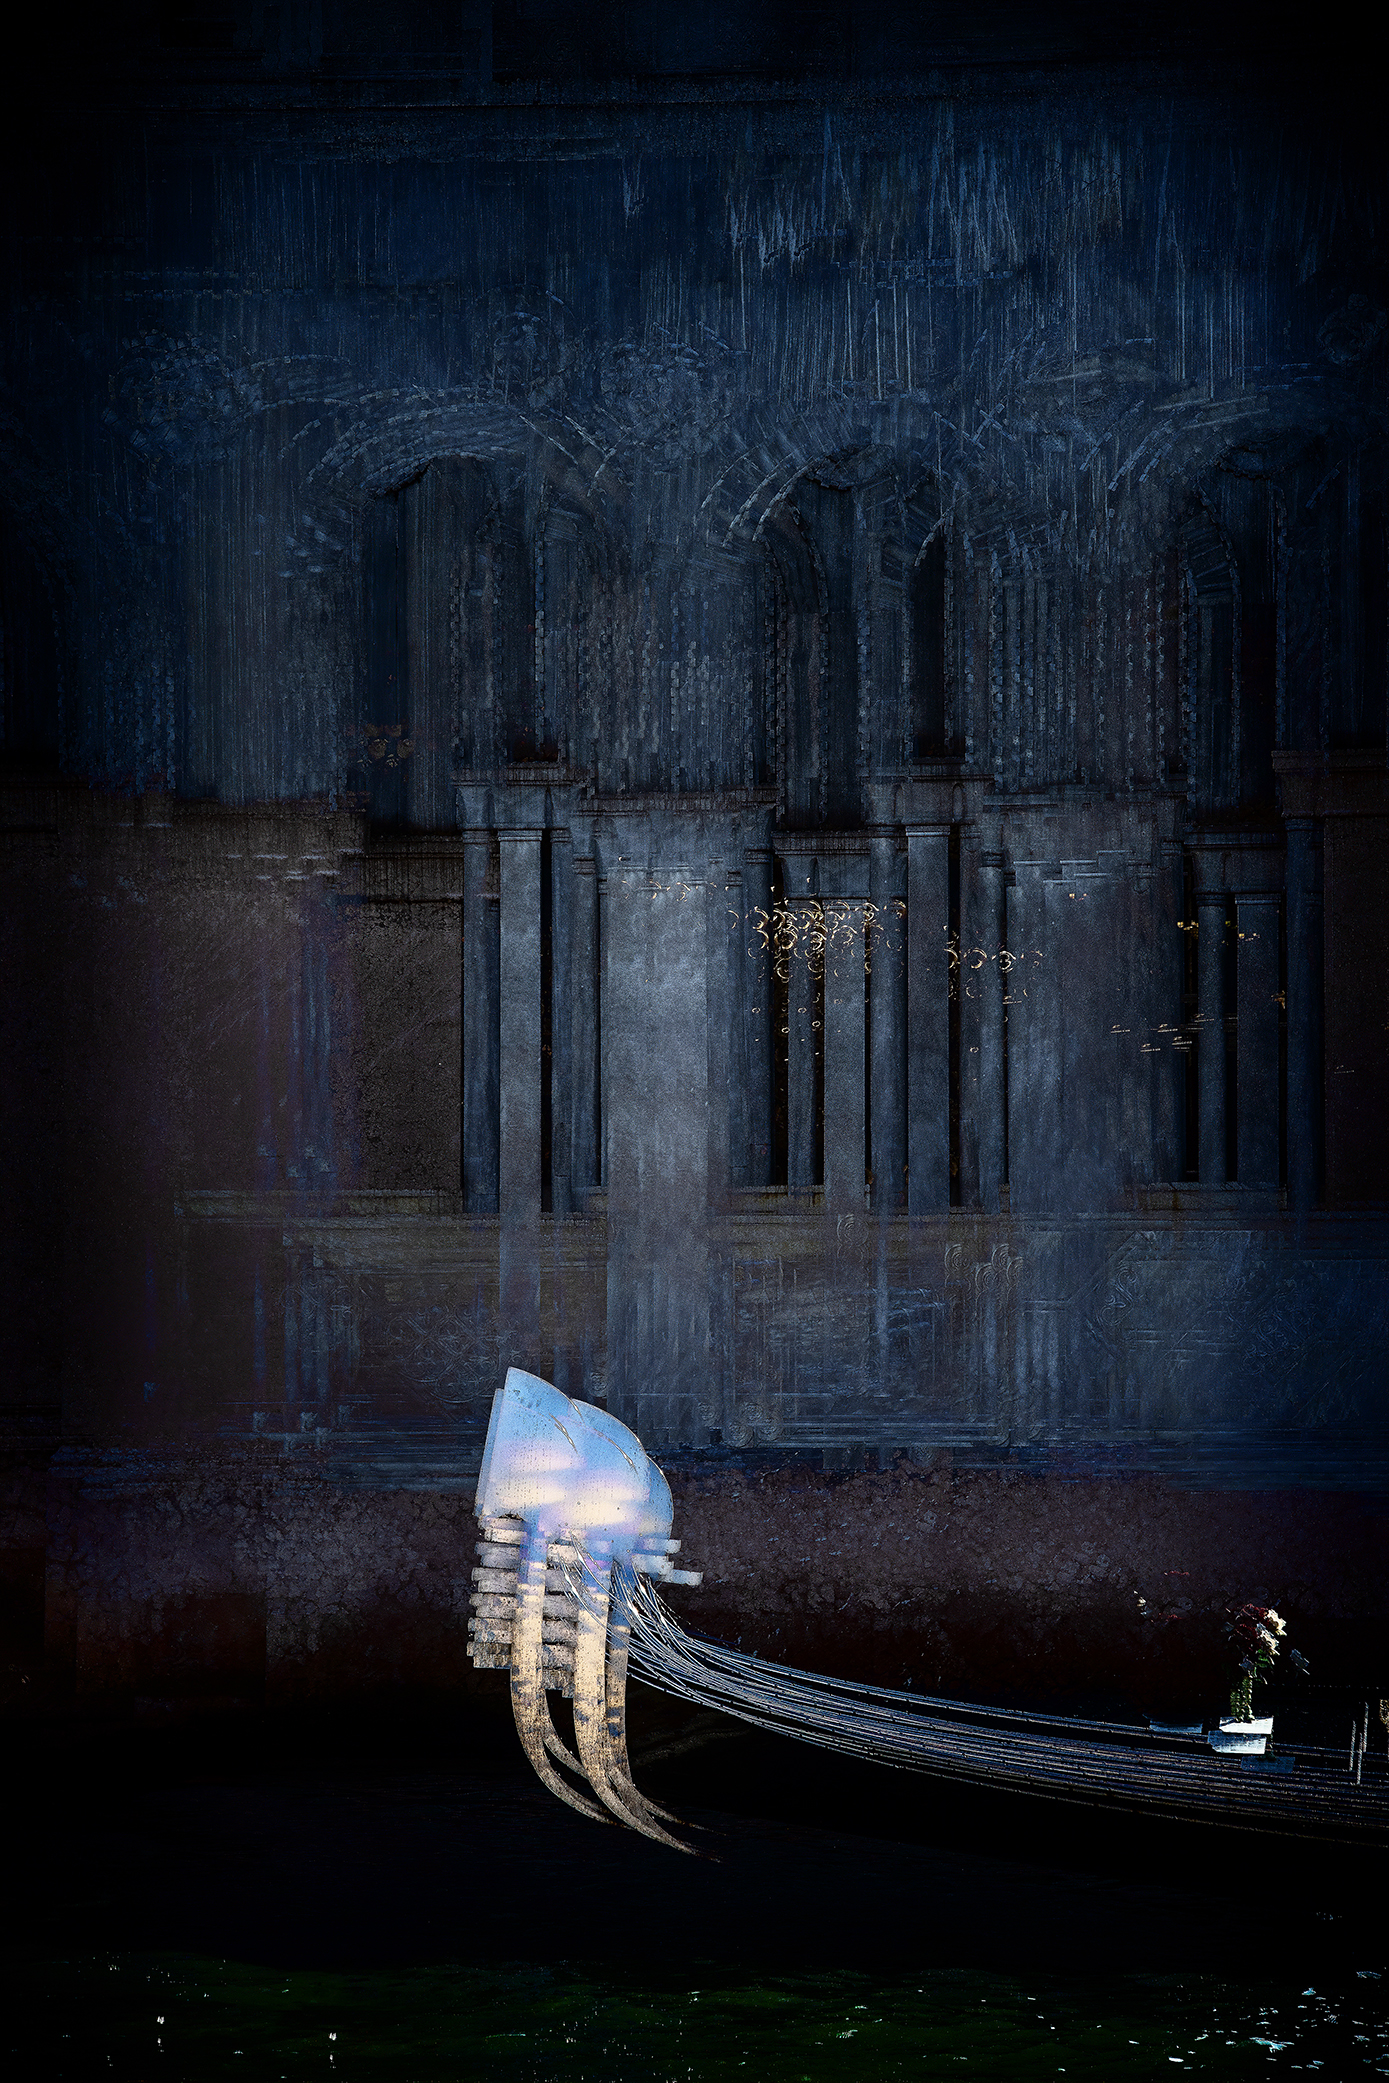 'Nocturne. Venezia